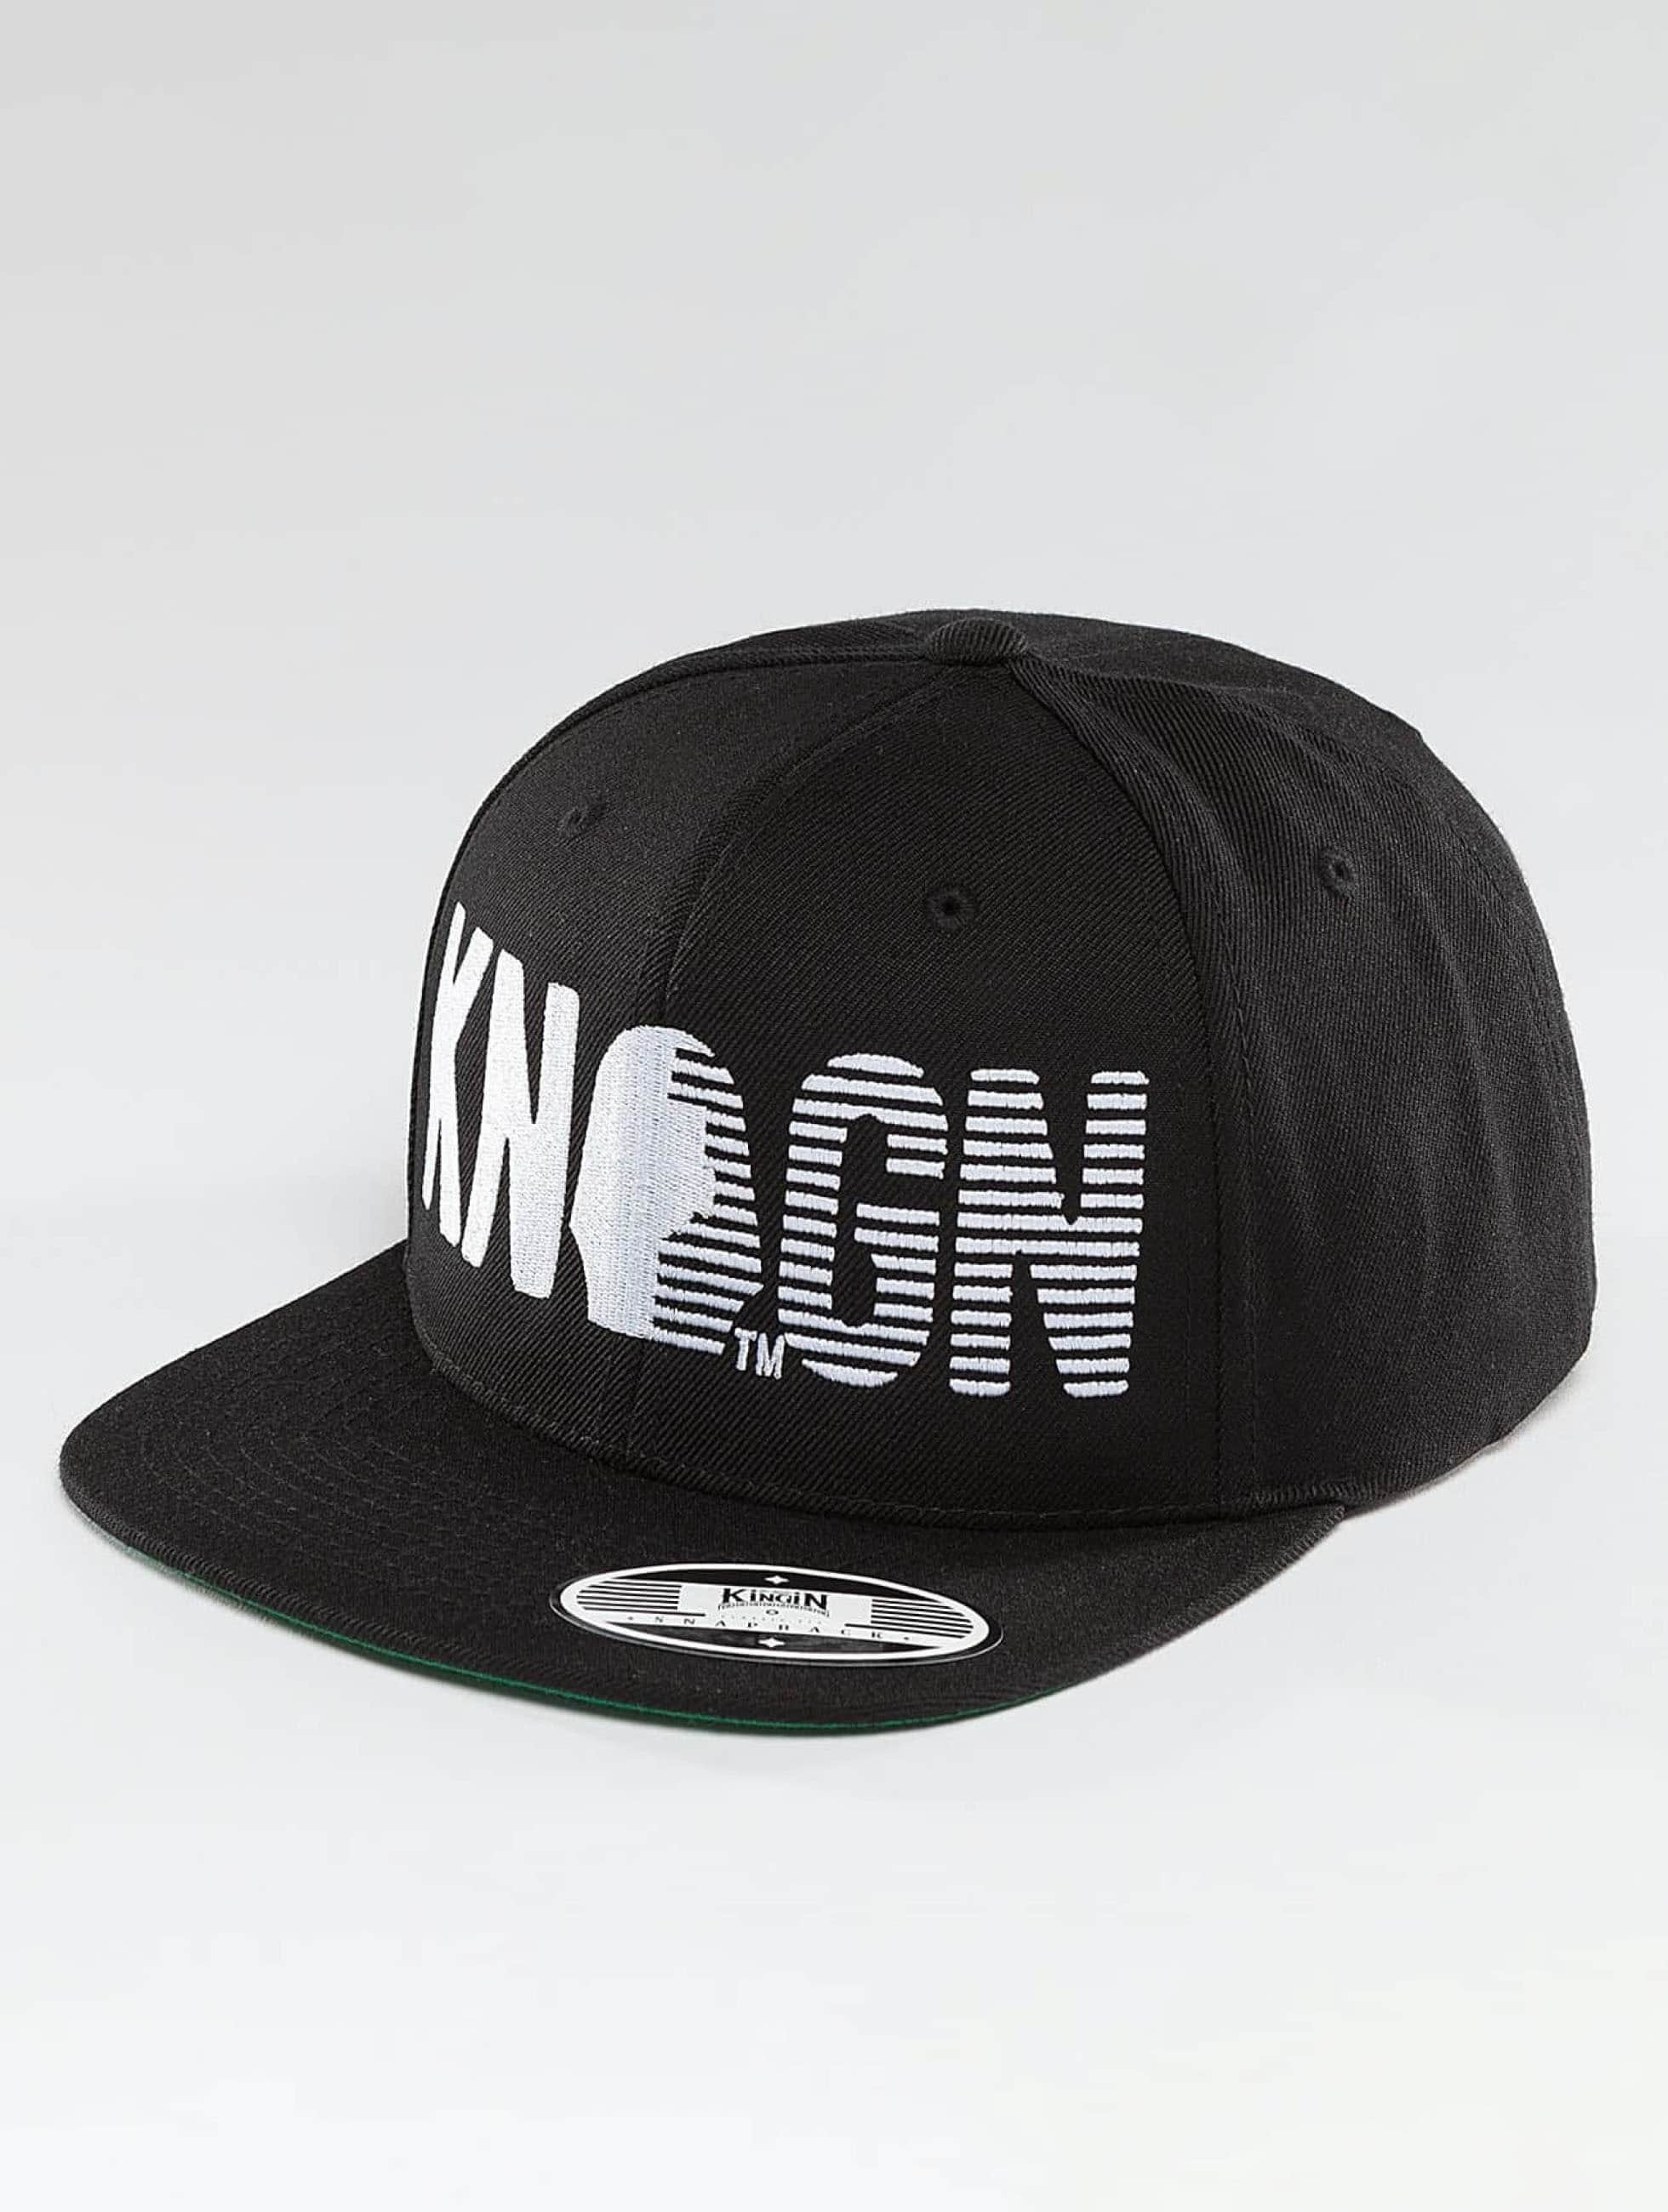 Kingin Männer,Frauen Snapback Cap Logo in schwarz